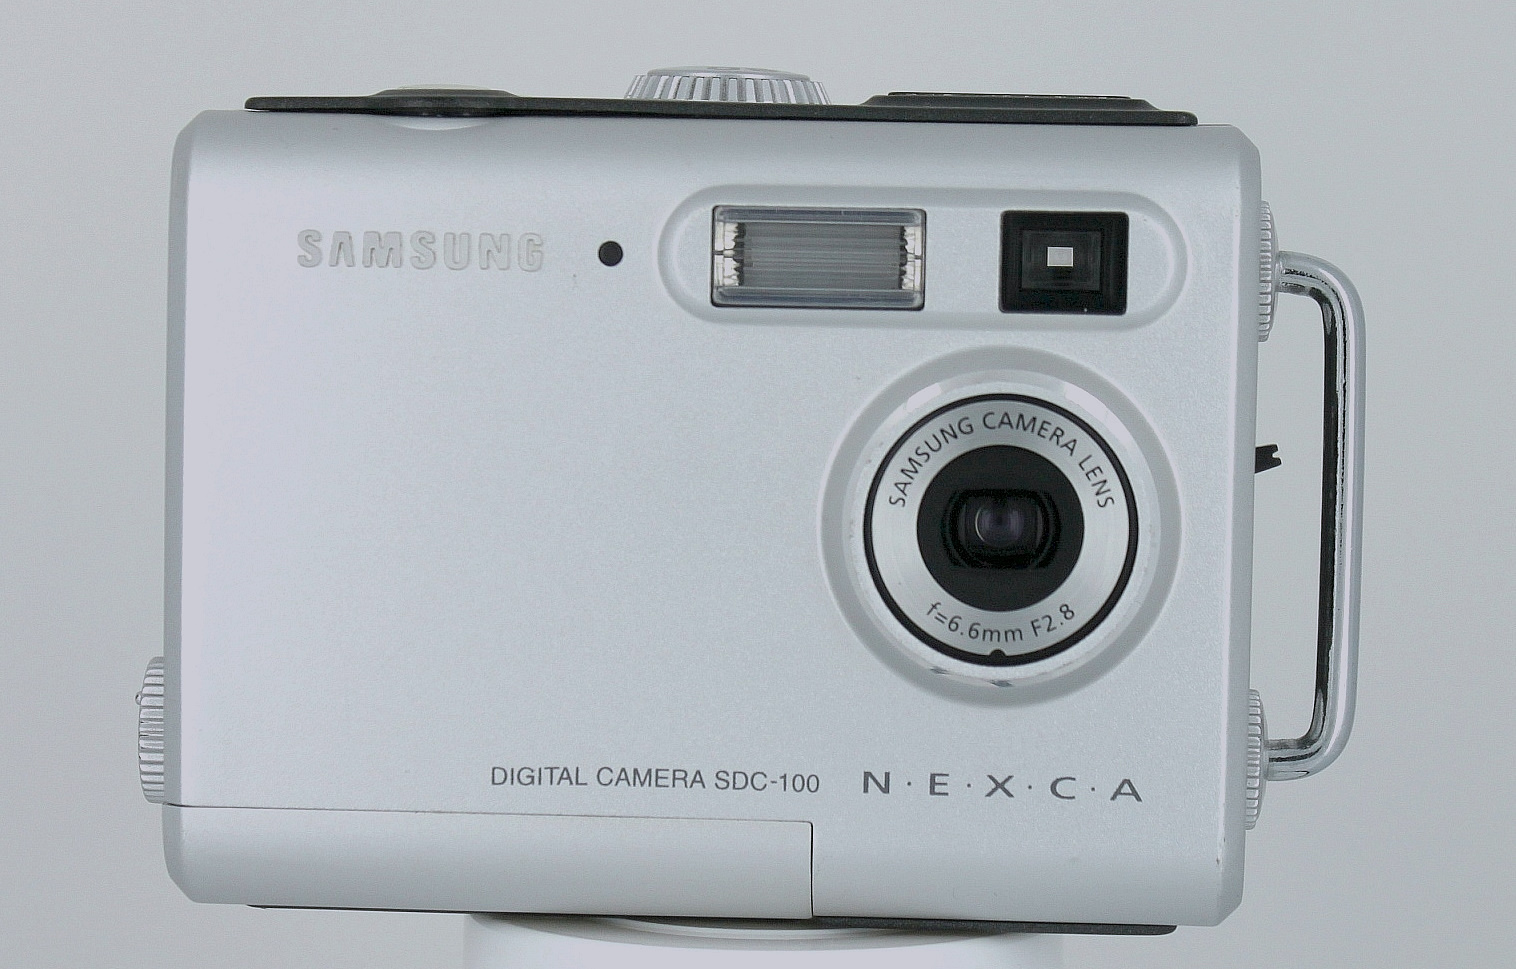 Samsung SDC-100 (1999)